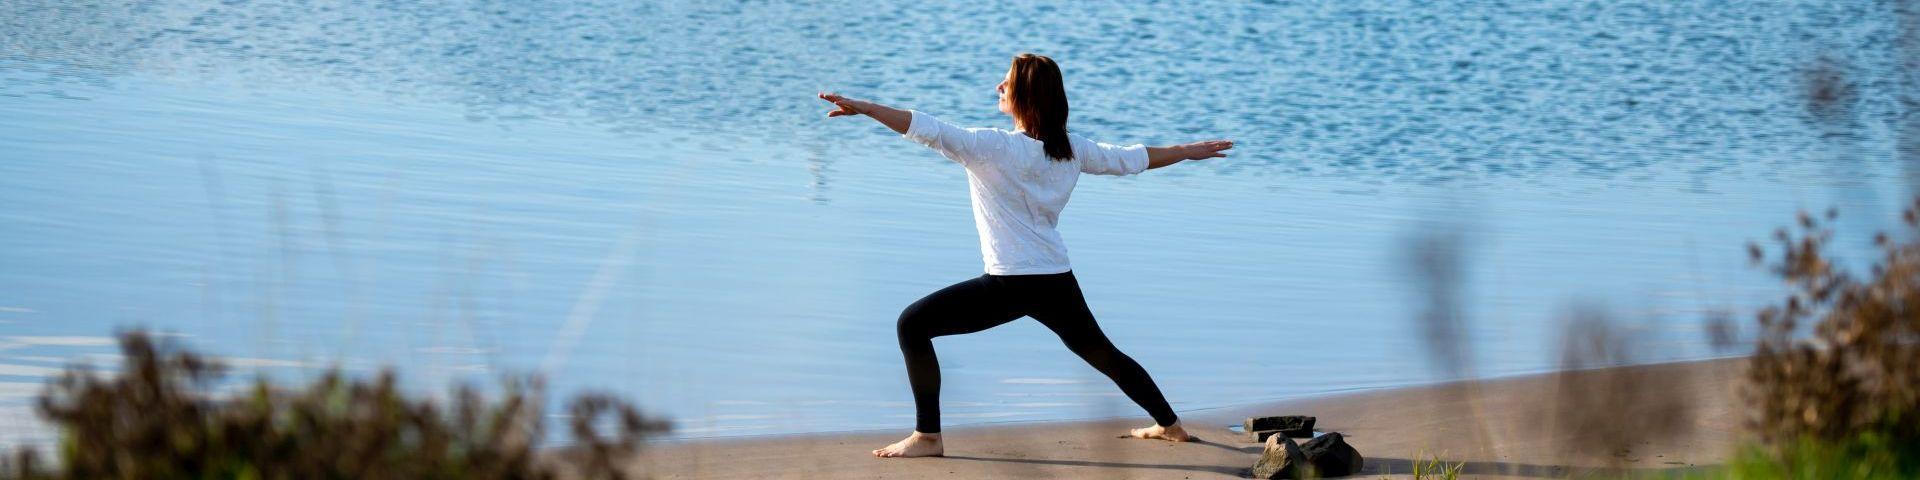 Yoga - Banner_Leefstijlcoach-Wageningen-Ede-Bennekom-yoga-coaching-personal-training_DSC_1423